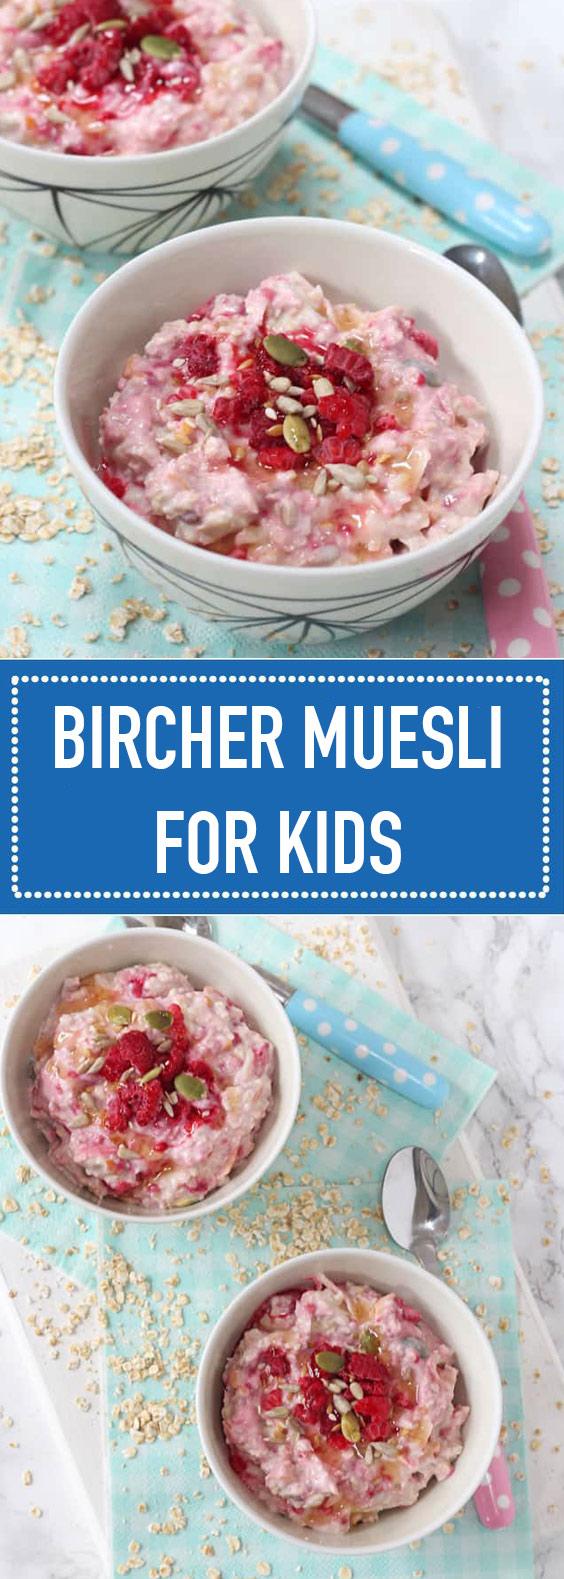 Easy Bircher Muesli Breakfast for Kids